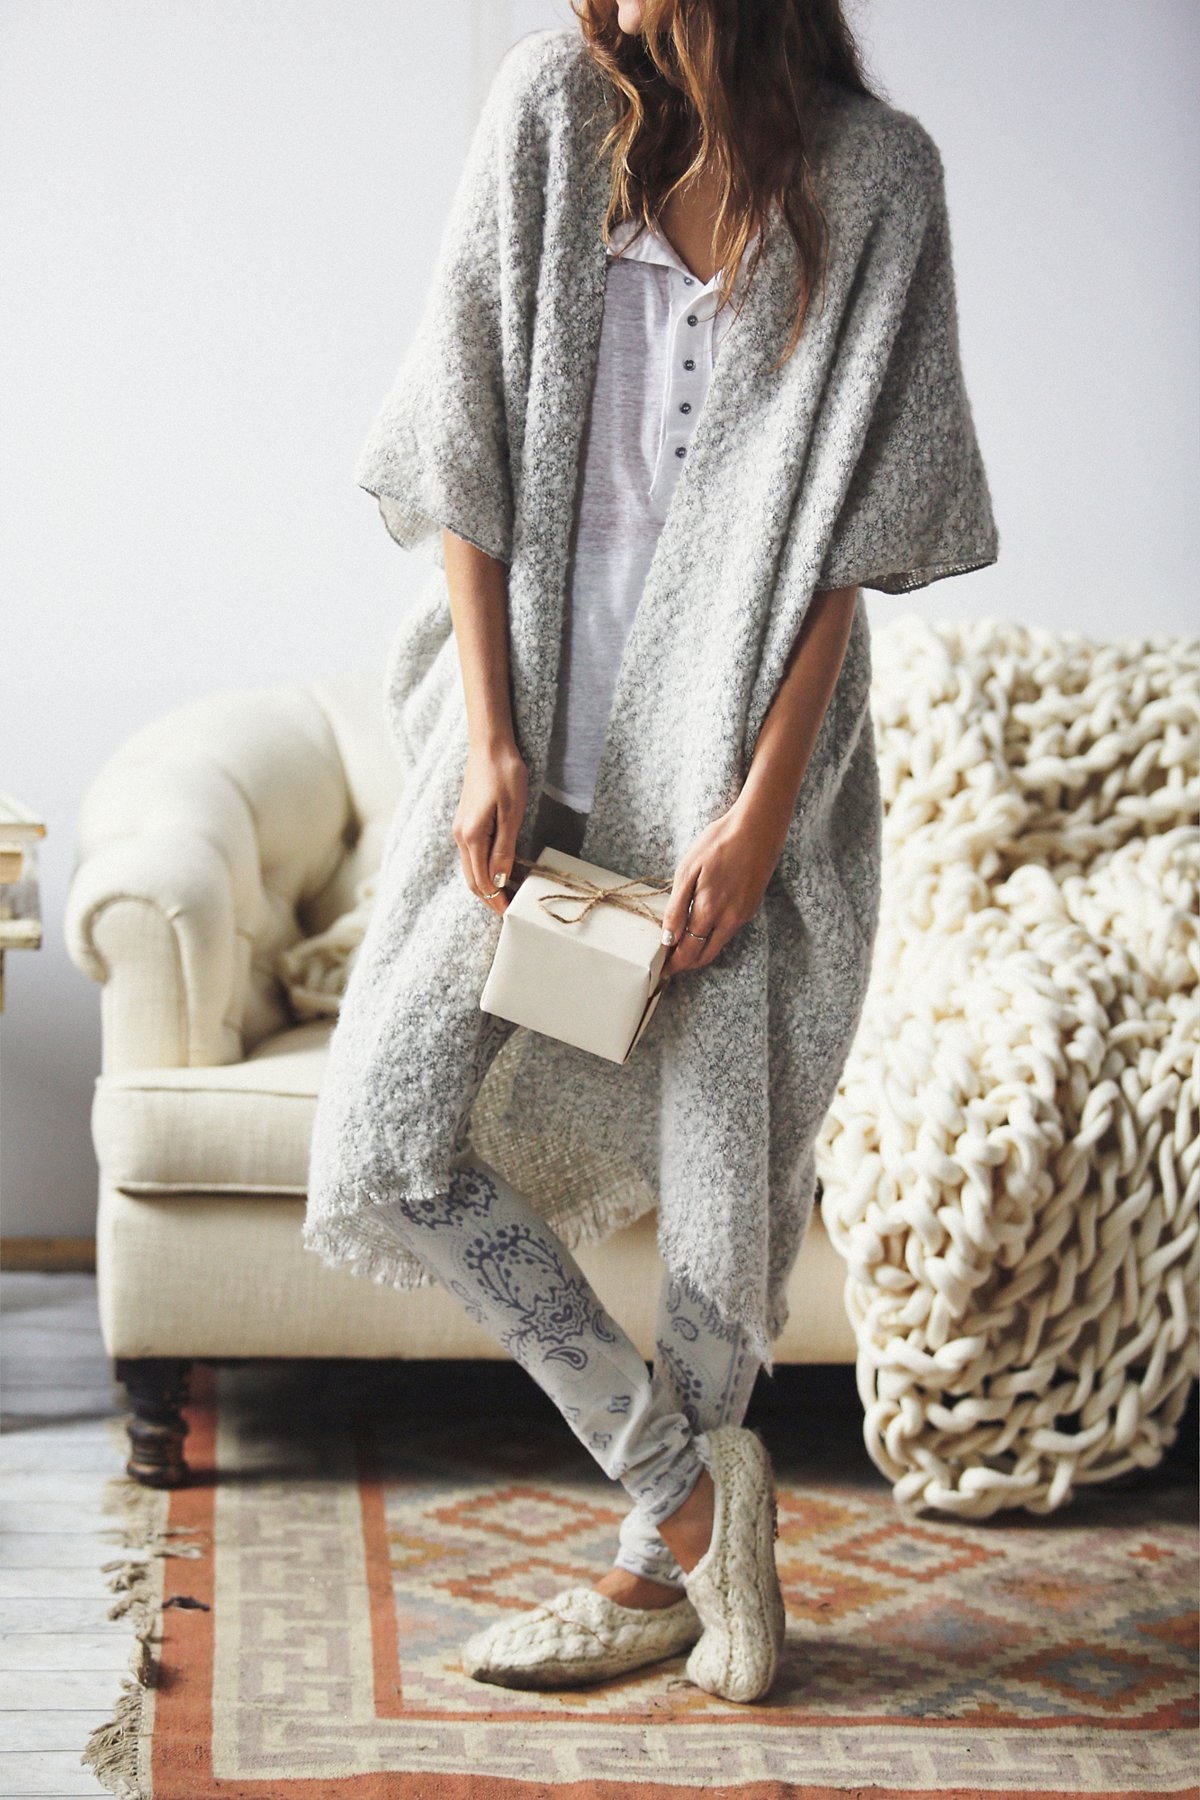 Weekend毛圈花式线和服式上衣